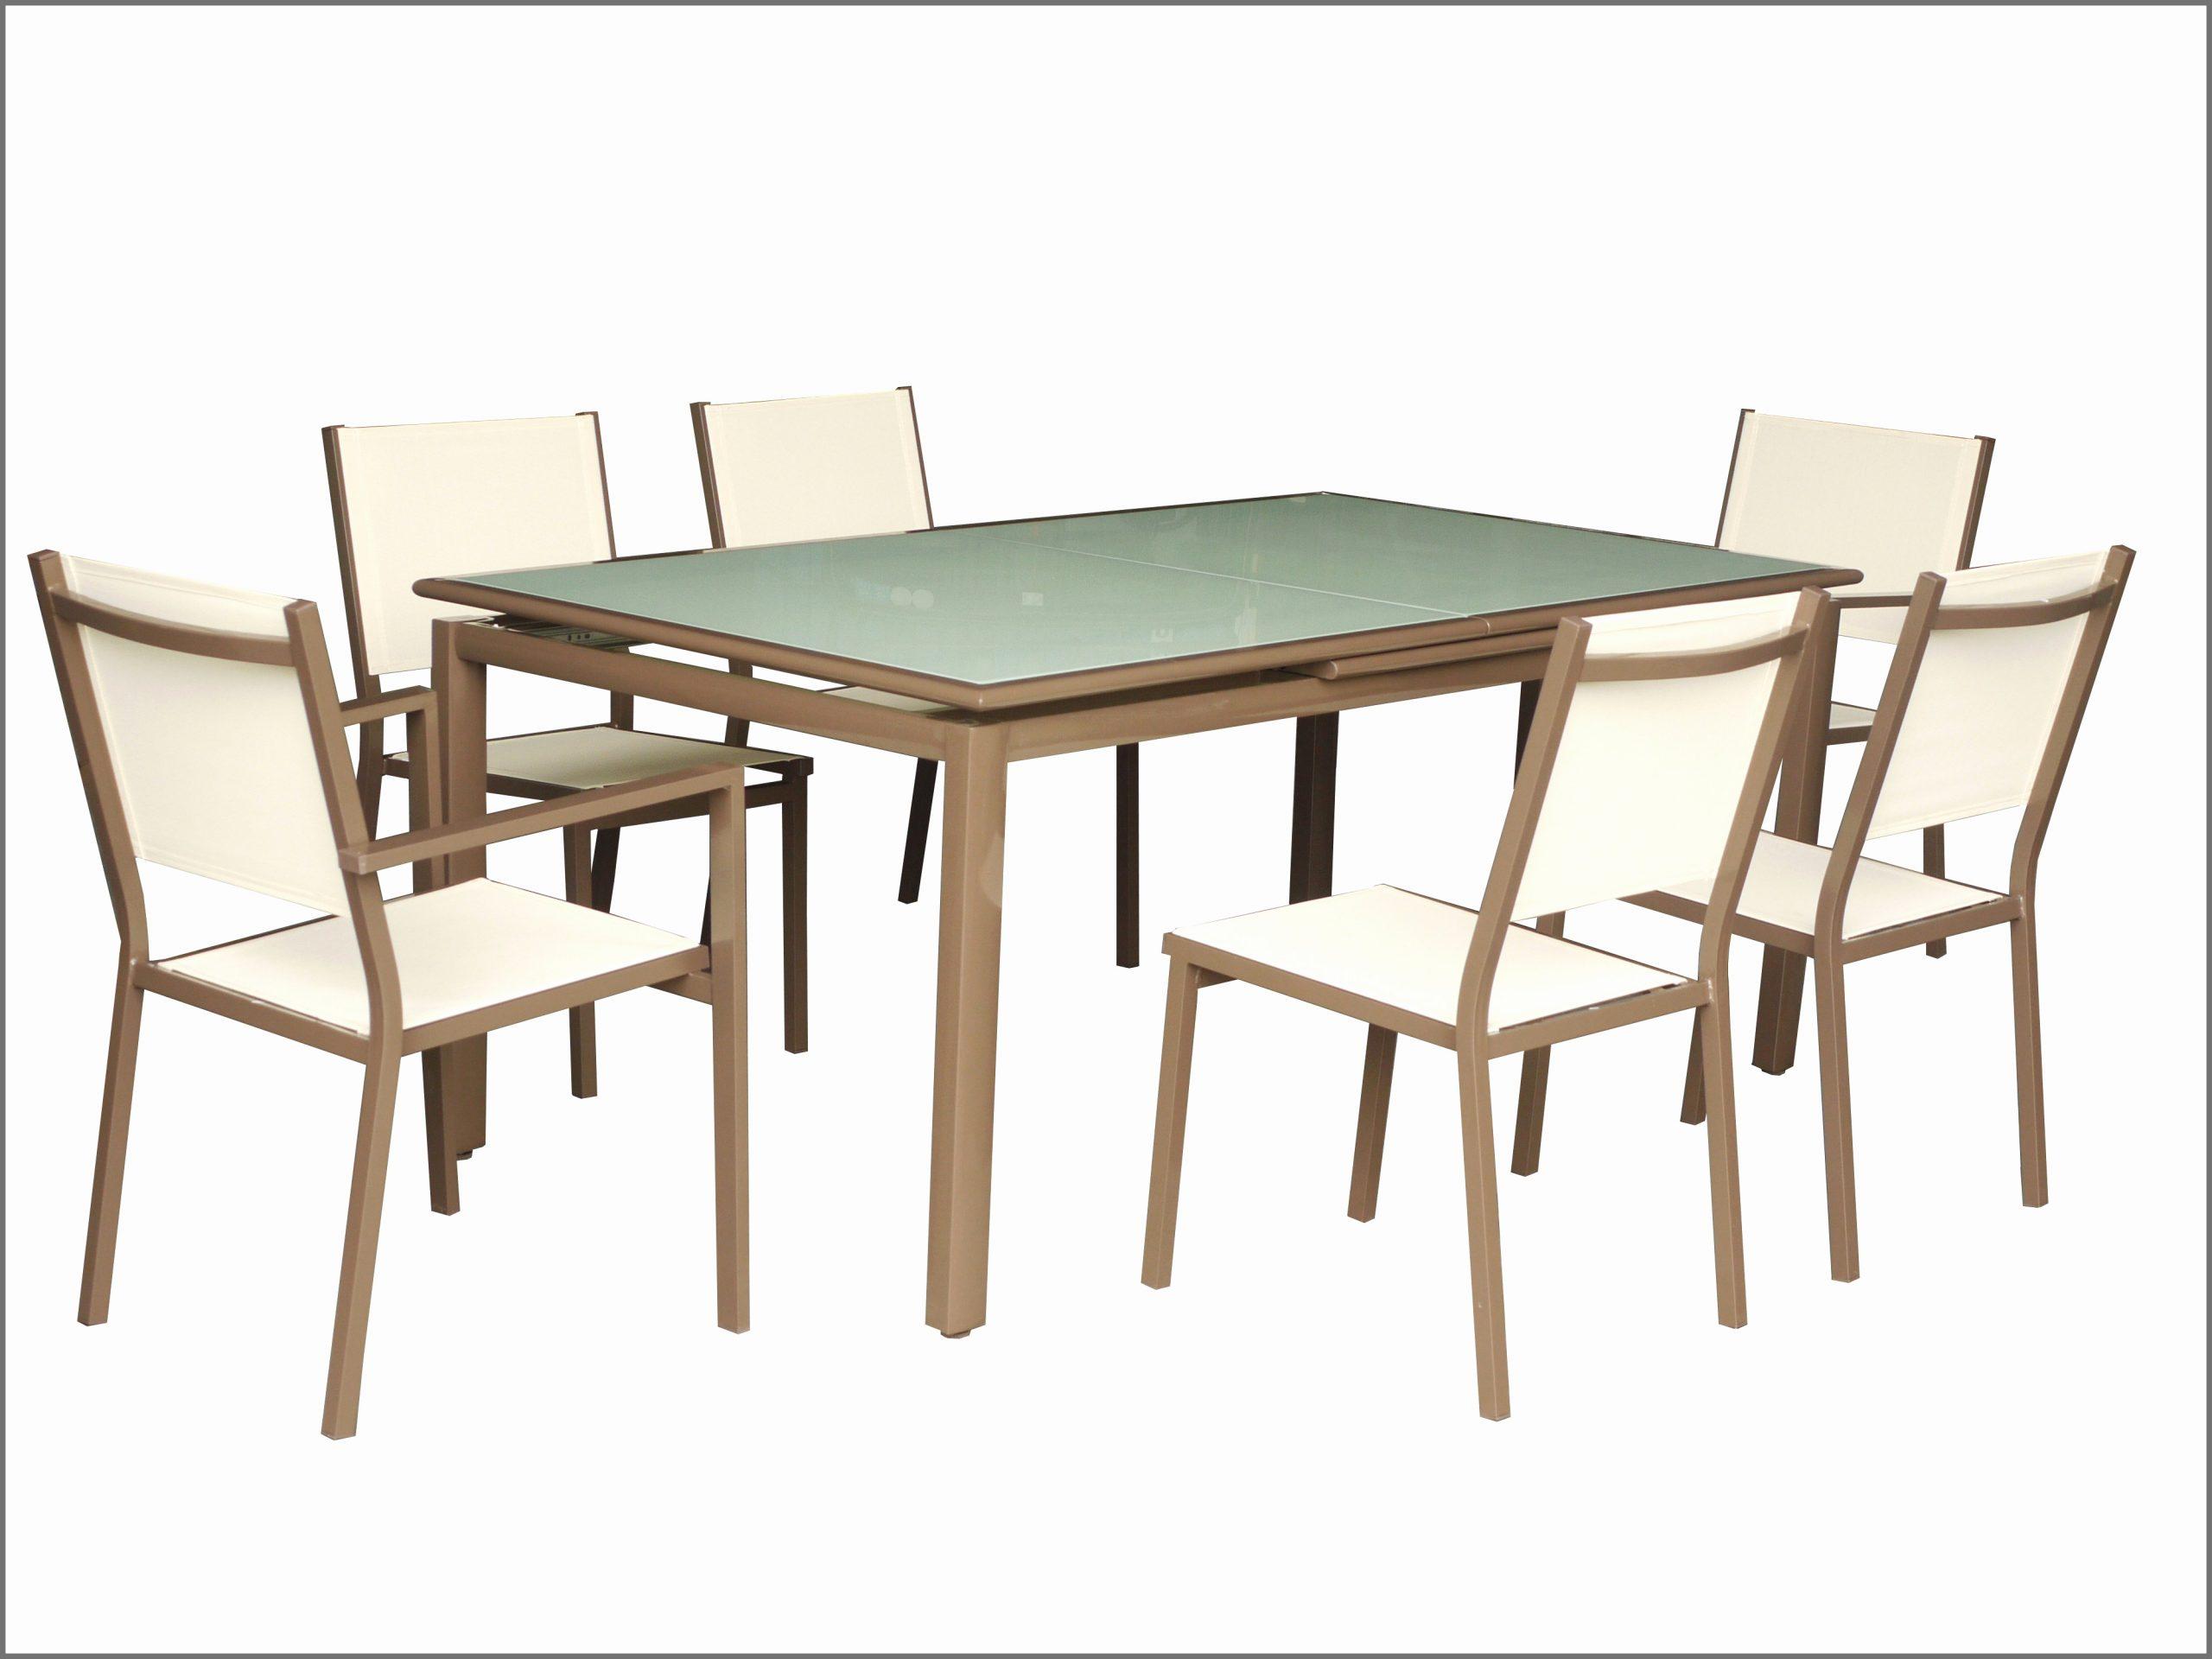 Balancelle De Jardin Leroy Merlin Beau 79 Housse Table De ... intérieur Housse Table De Jardin Leroy Merlin